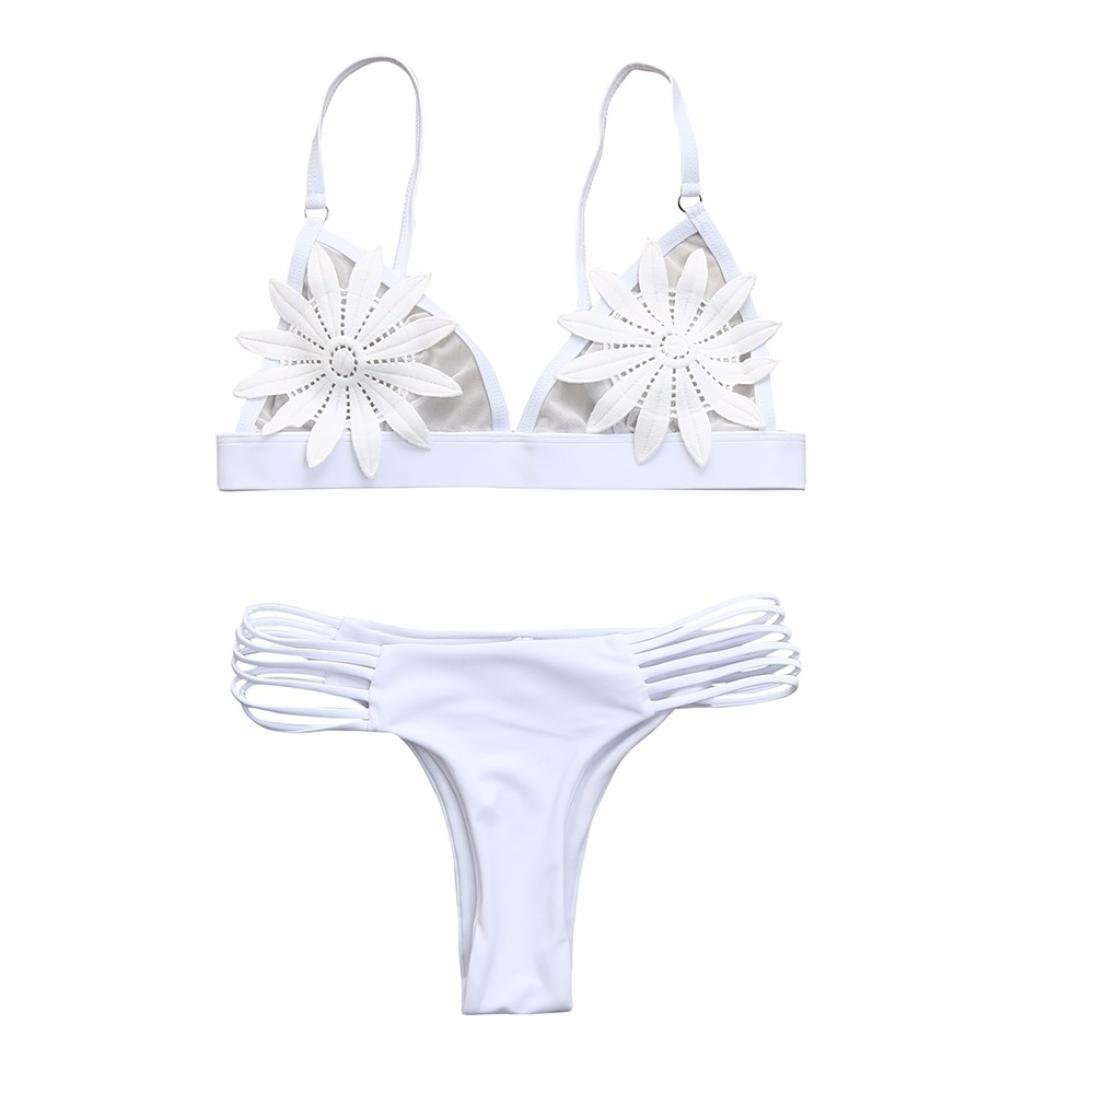 Women Swimwear Bikini Sets Exotic Swimsuits Sexy Tankini Two-Piece Top Bottom Swimsuit for Maternity